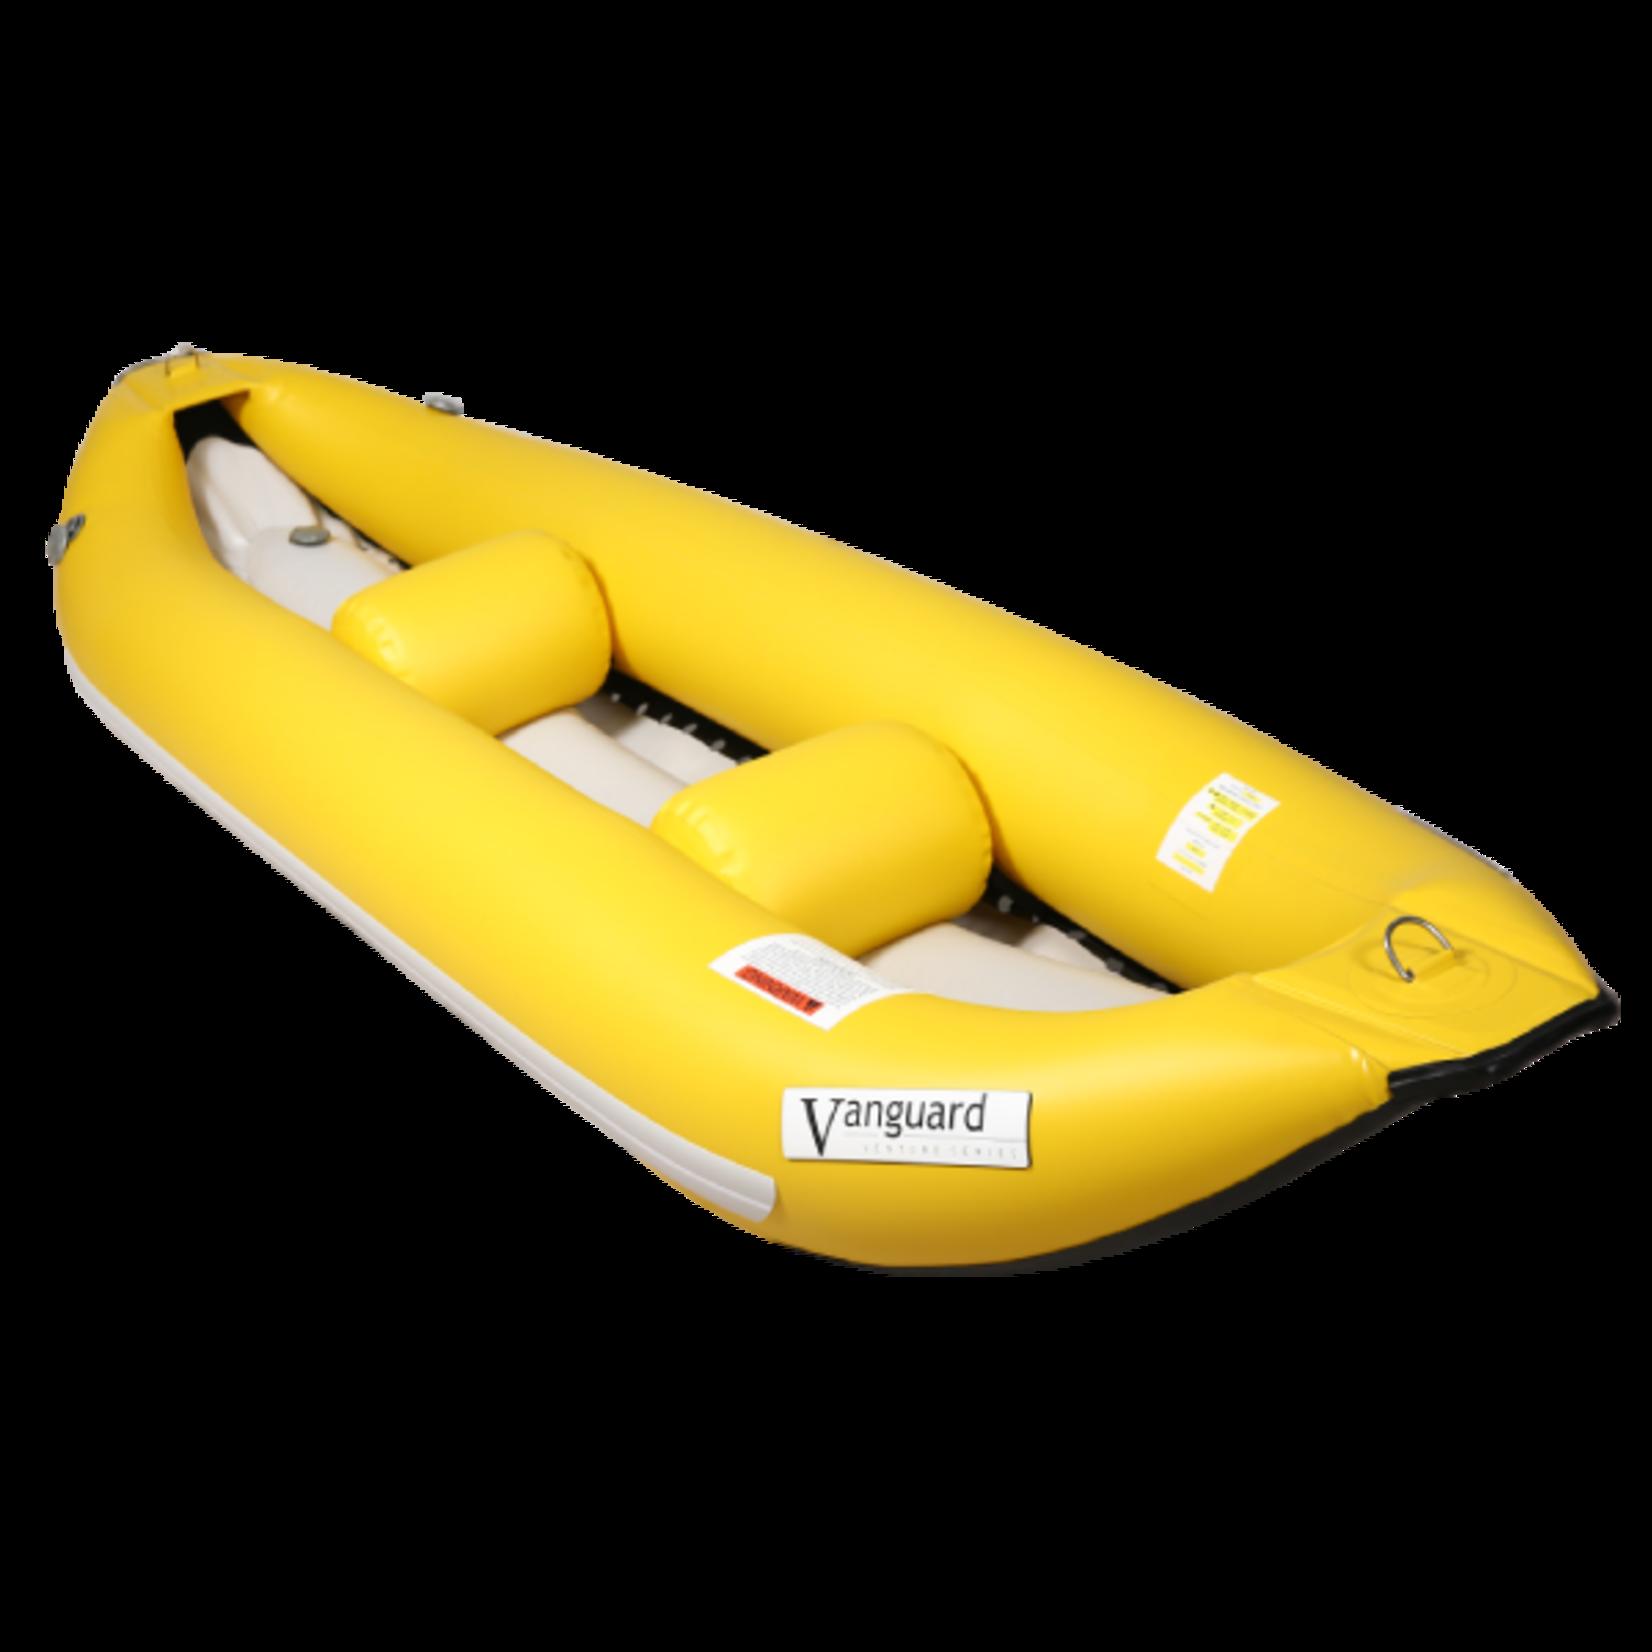 Vanguard Inflatables Vanguard 2-Person Self Bailing Kayak